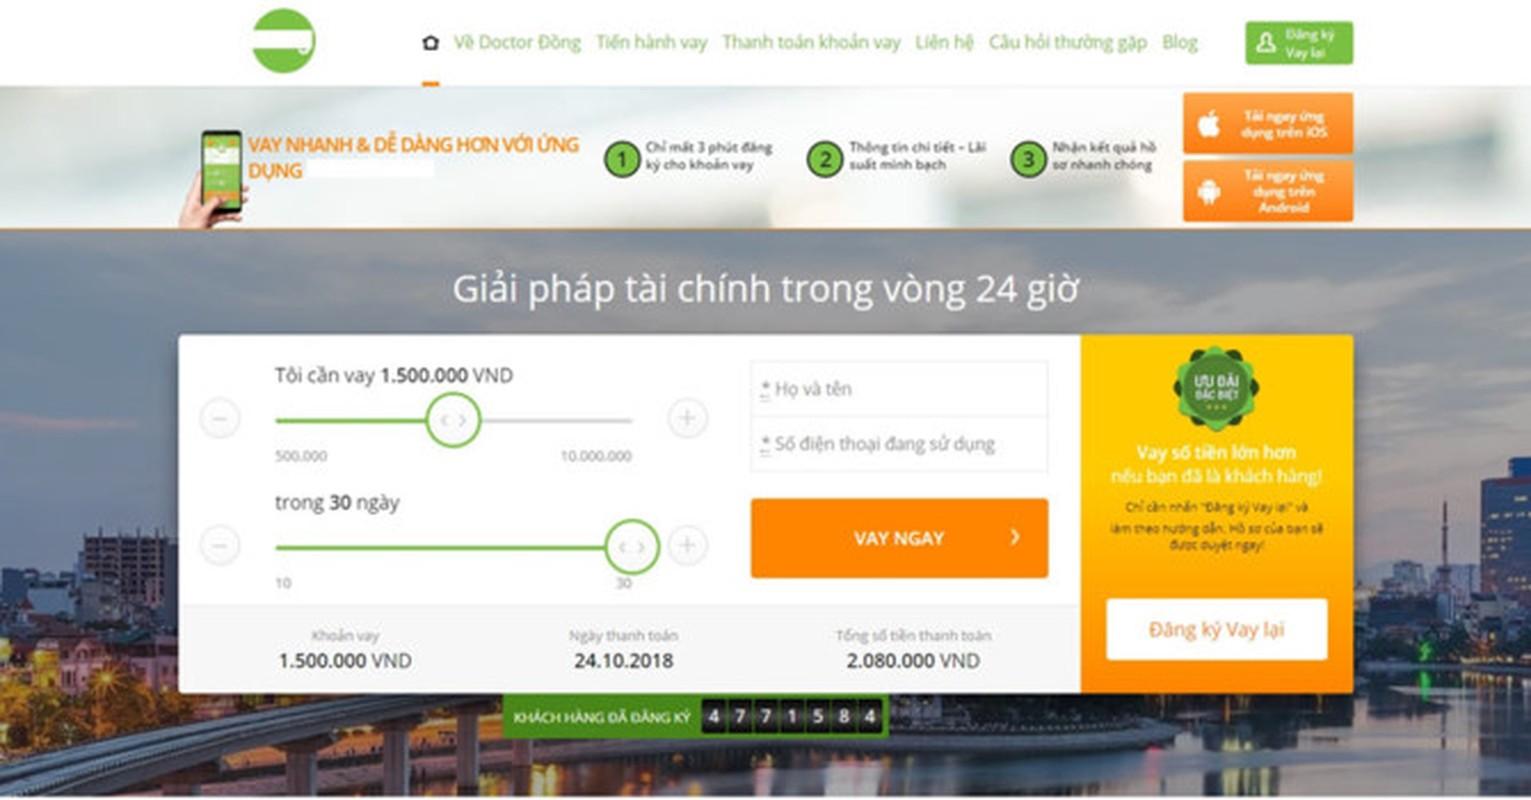 Vay tien online hiem hoa kho luong cho ban tre thieu hieu biet-Hinh-9